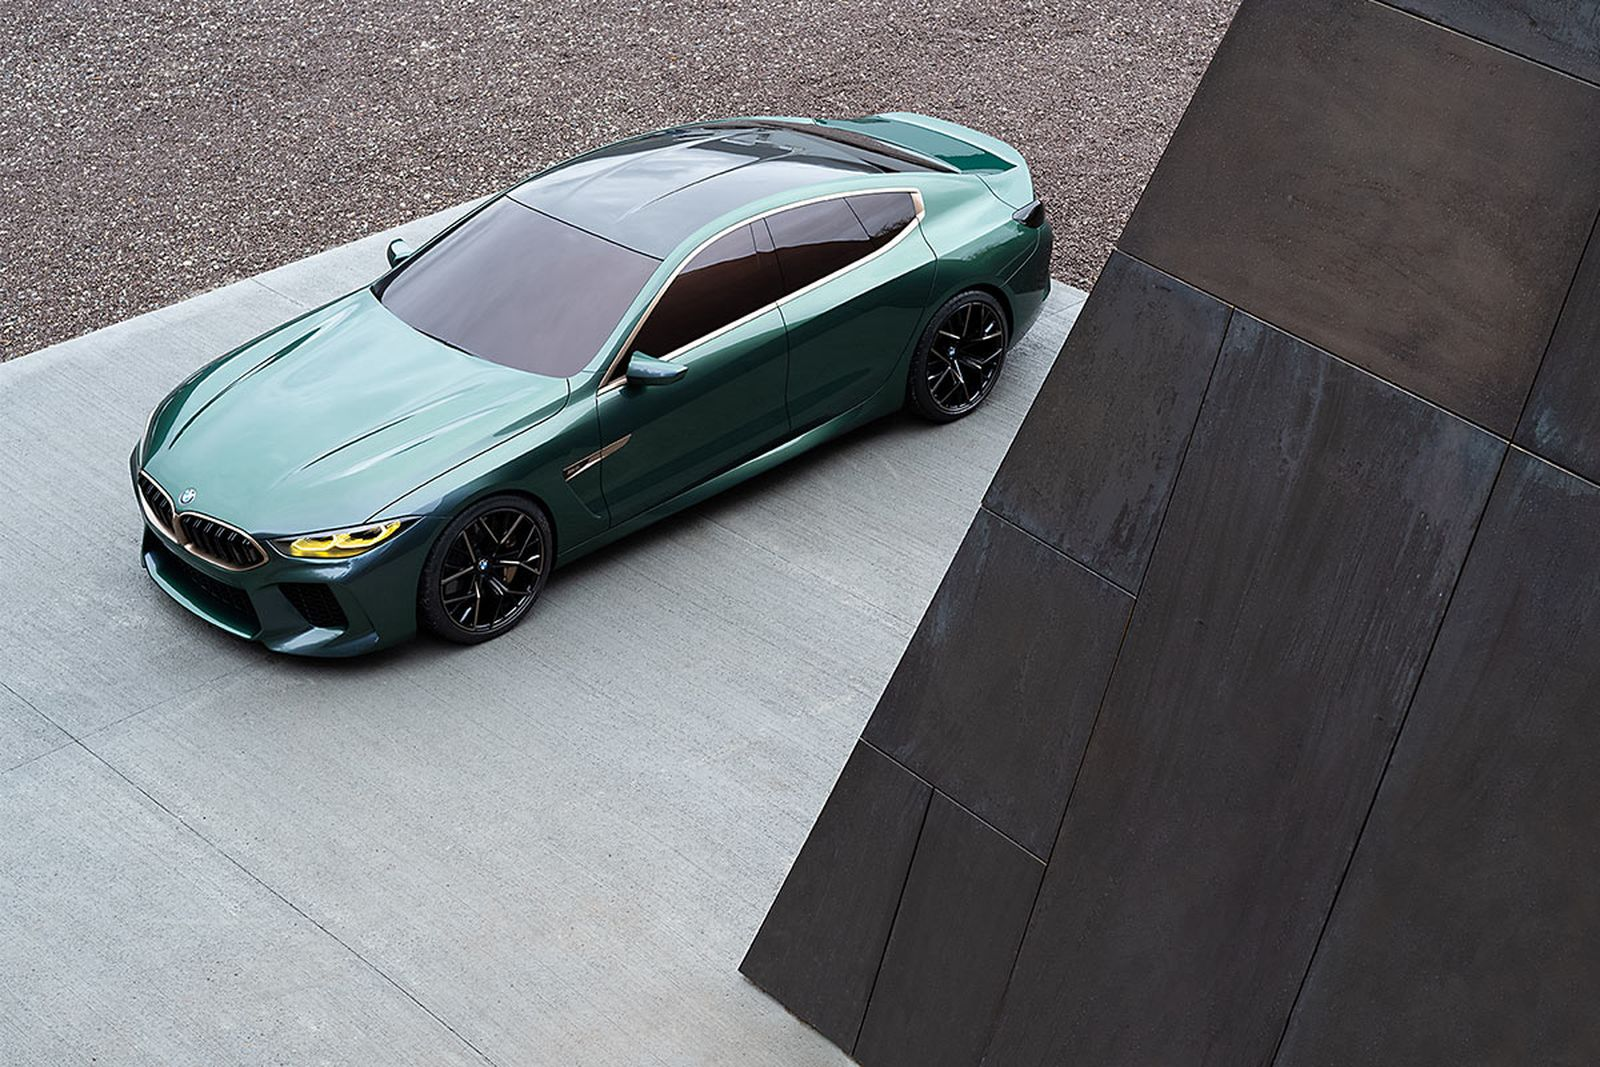 bmw m8 gran coupe modern luxury BMW Concept M8 Gran Coupé